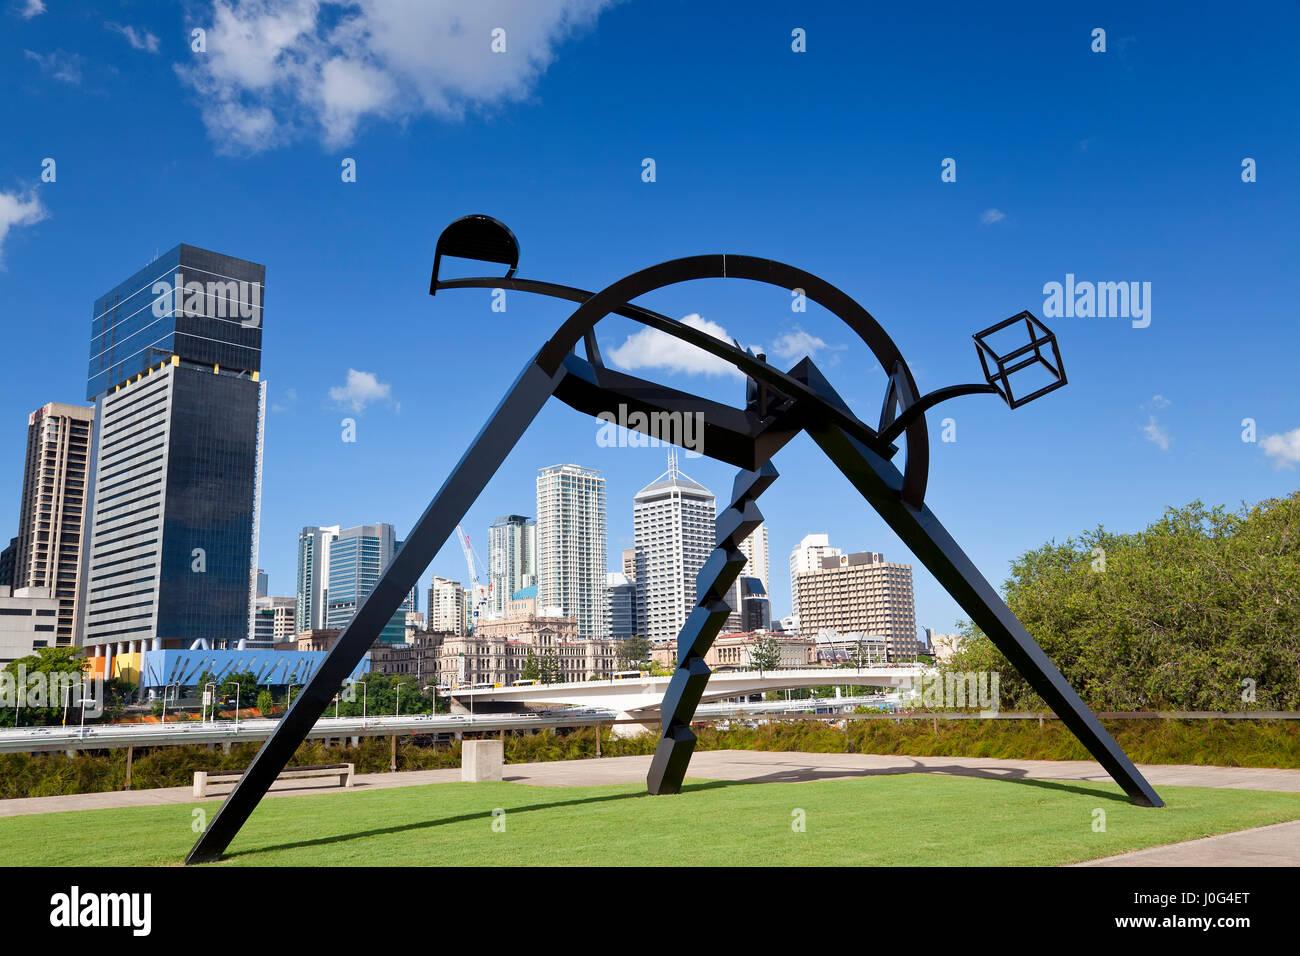 Sculpture outside Gallery of Modern Art, Brisbane, Queensland, Australia - Stock Image